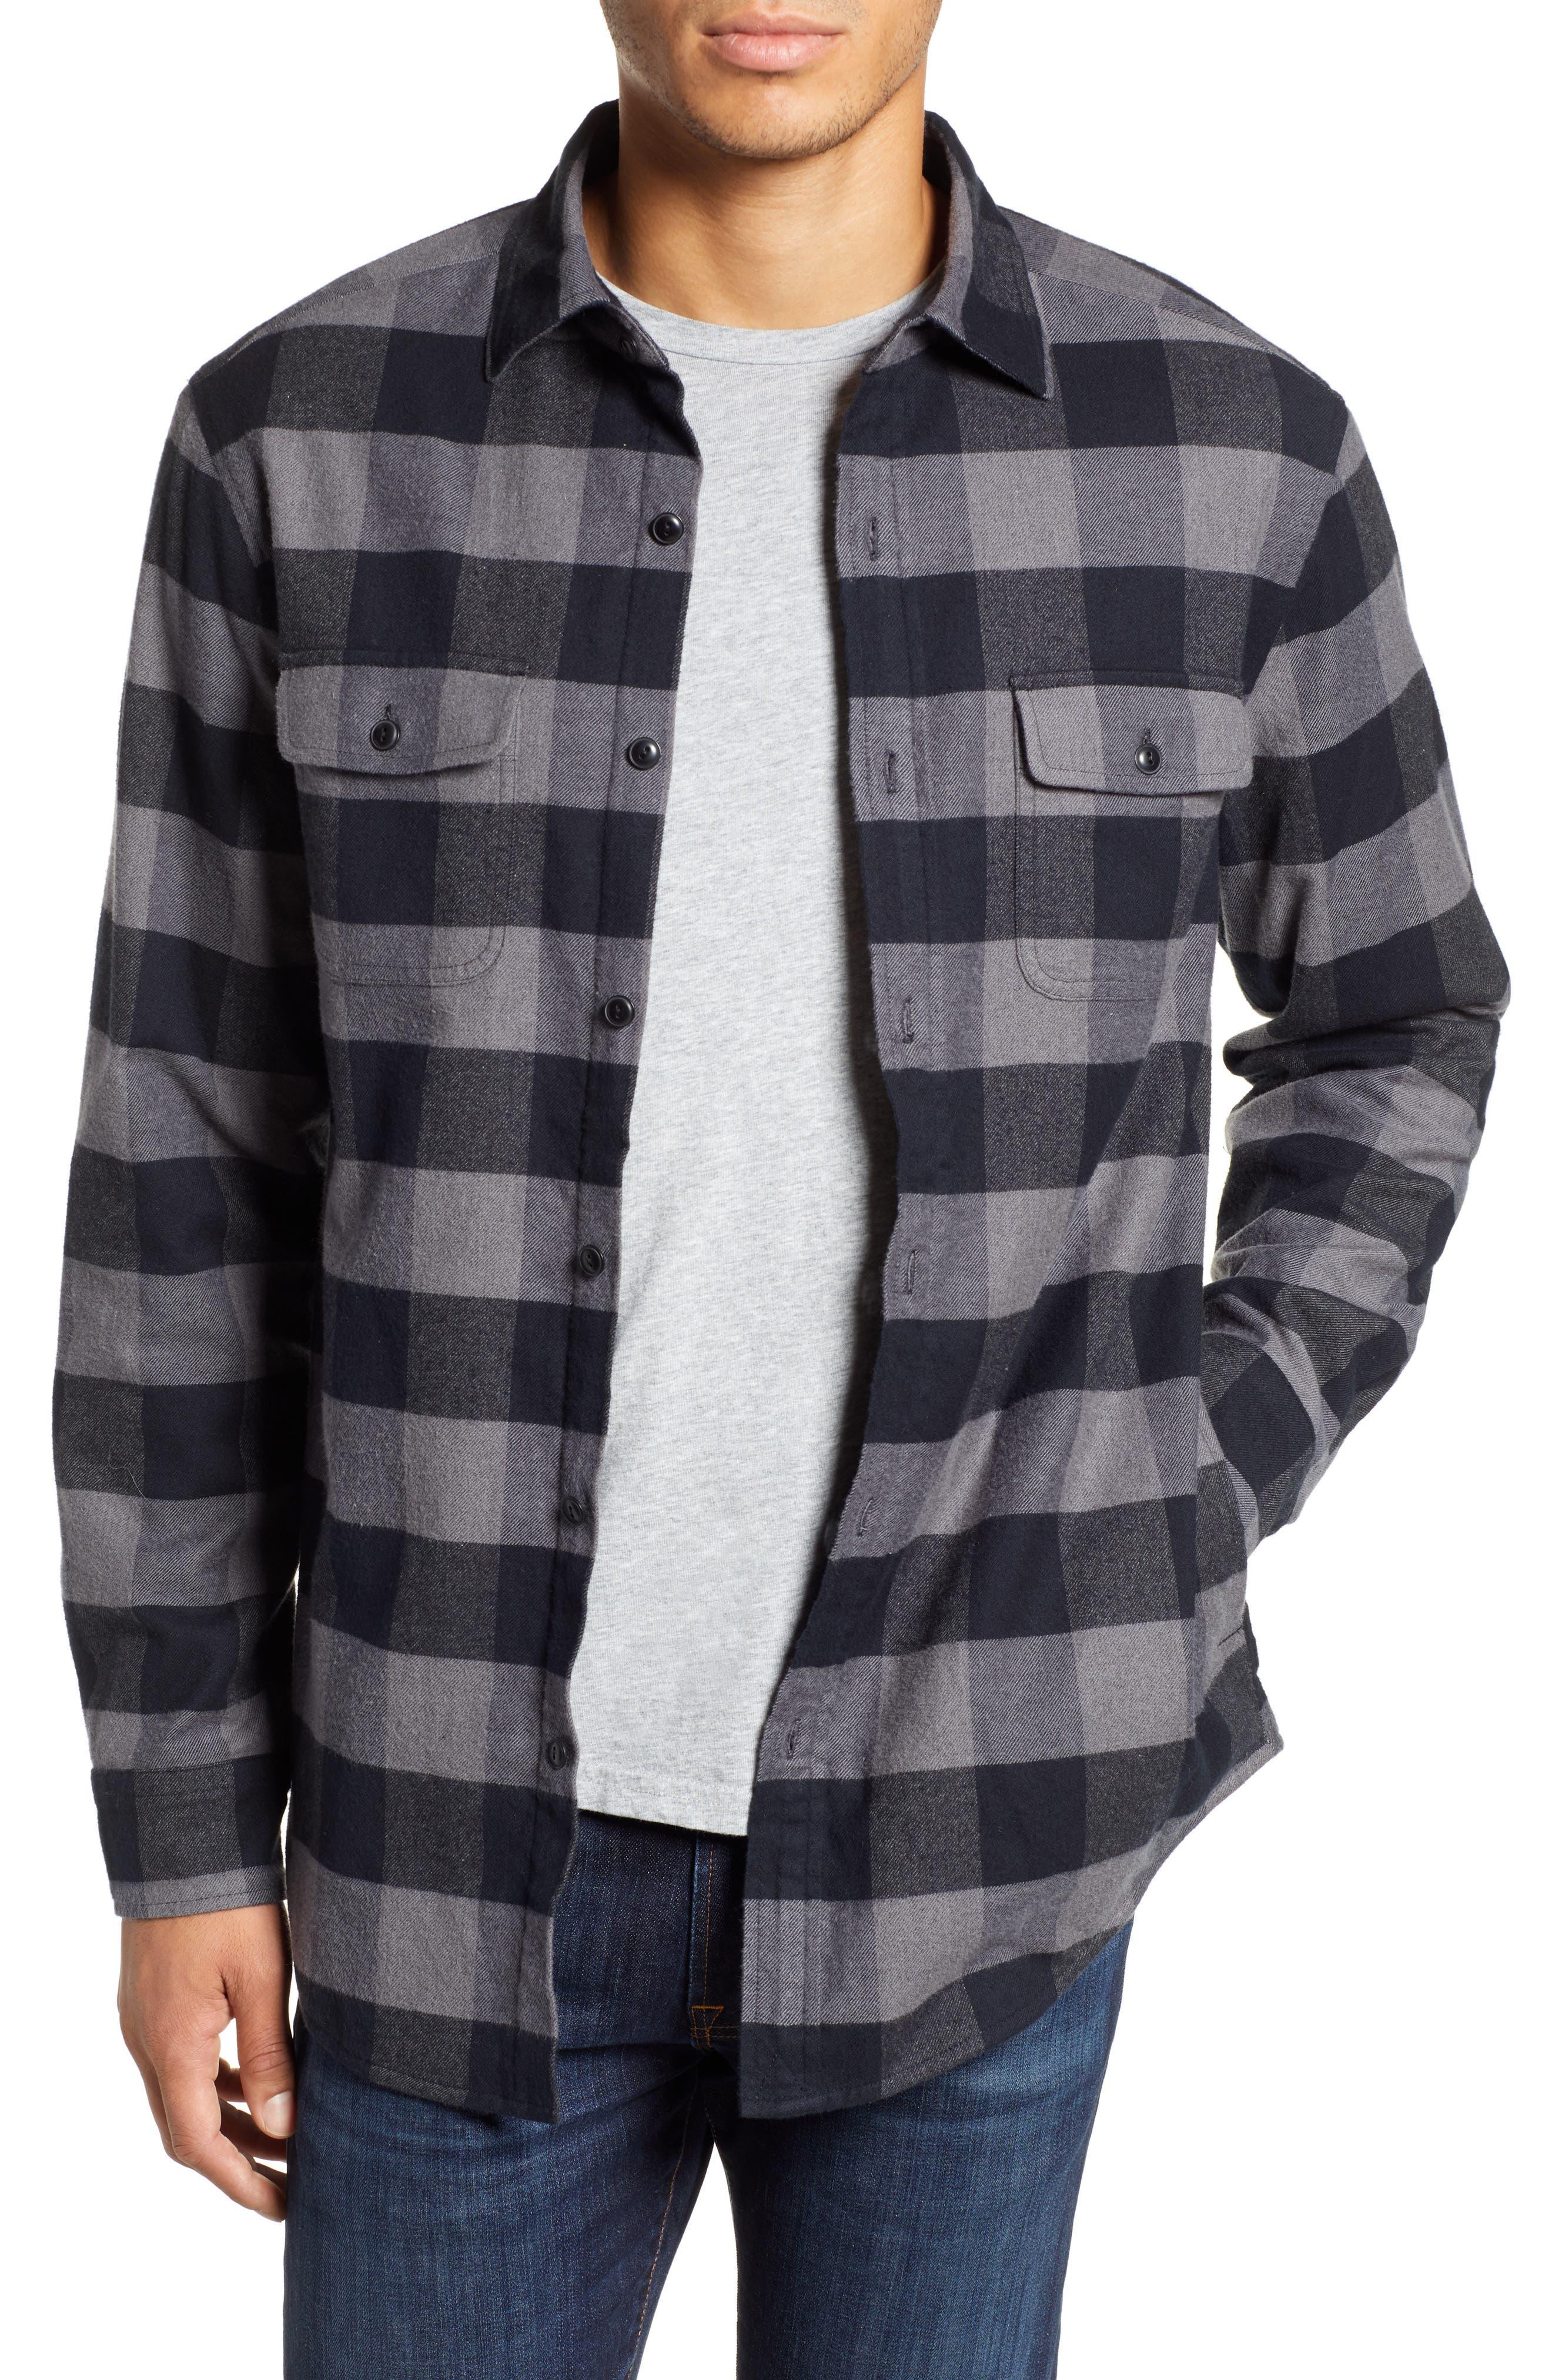 Deepwood Regular Fit Lined Flannel Shirt Jacket,                             Main thumbnail 1, color,                             EVENING SKY